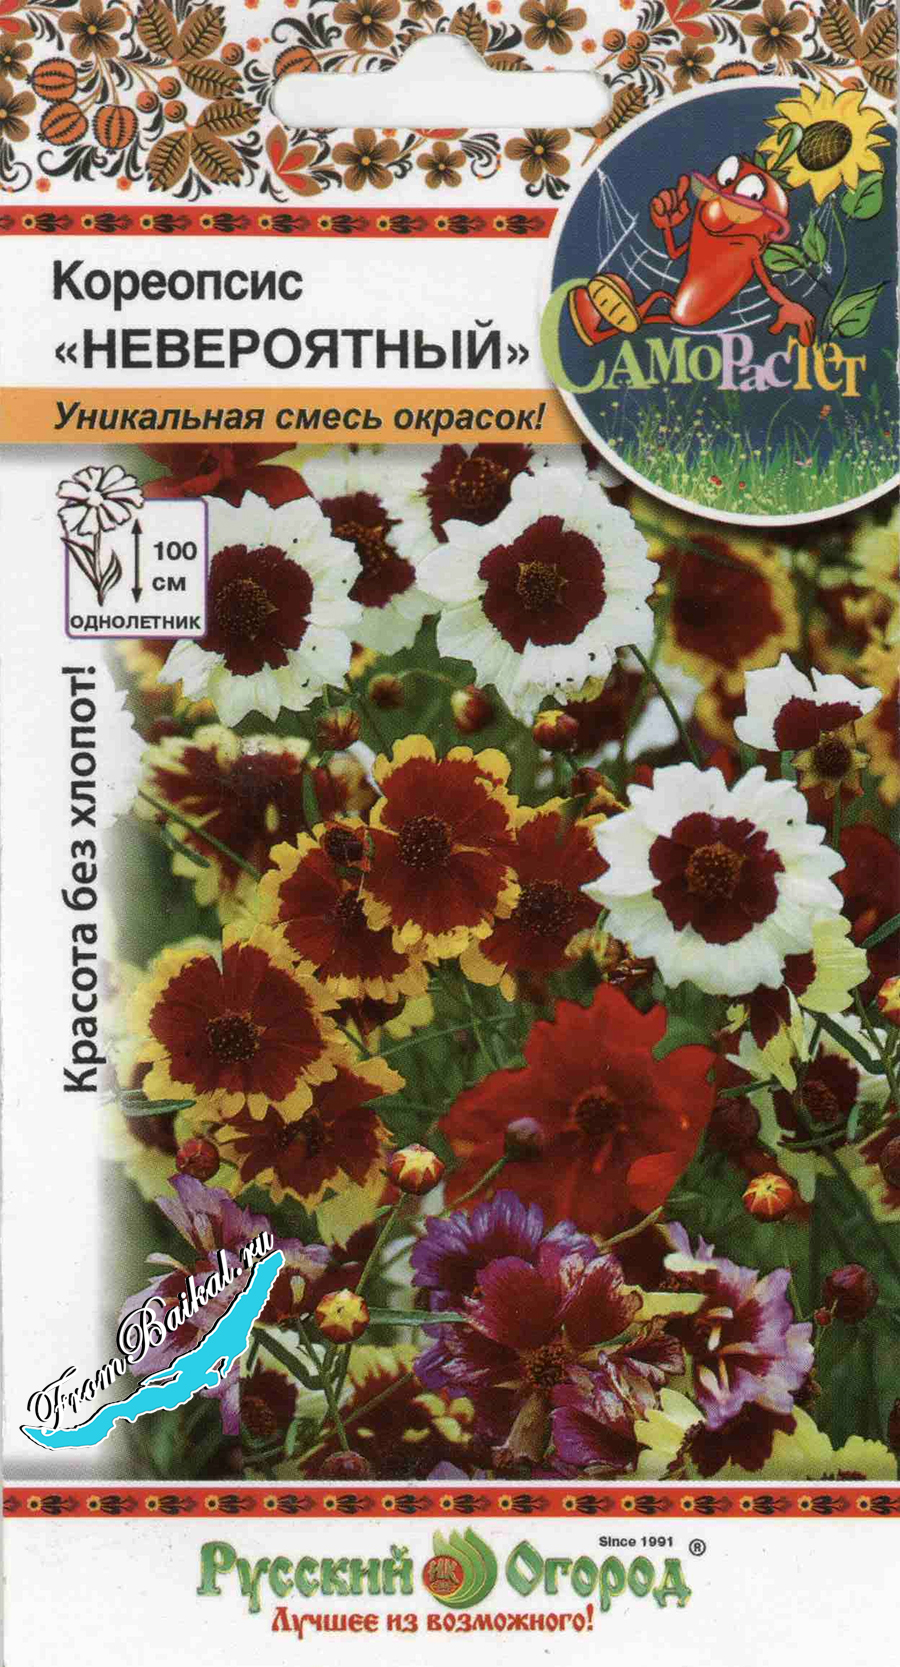 "Кореопсис ""Невероятный"" (Coreopsis x hybrida)"